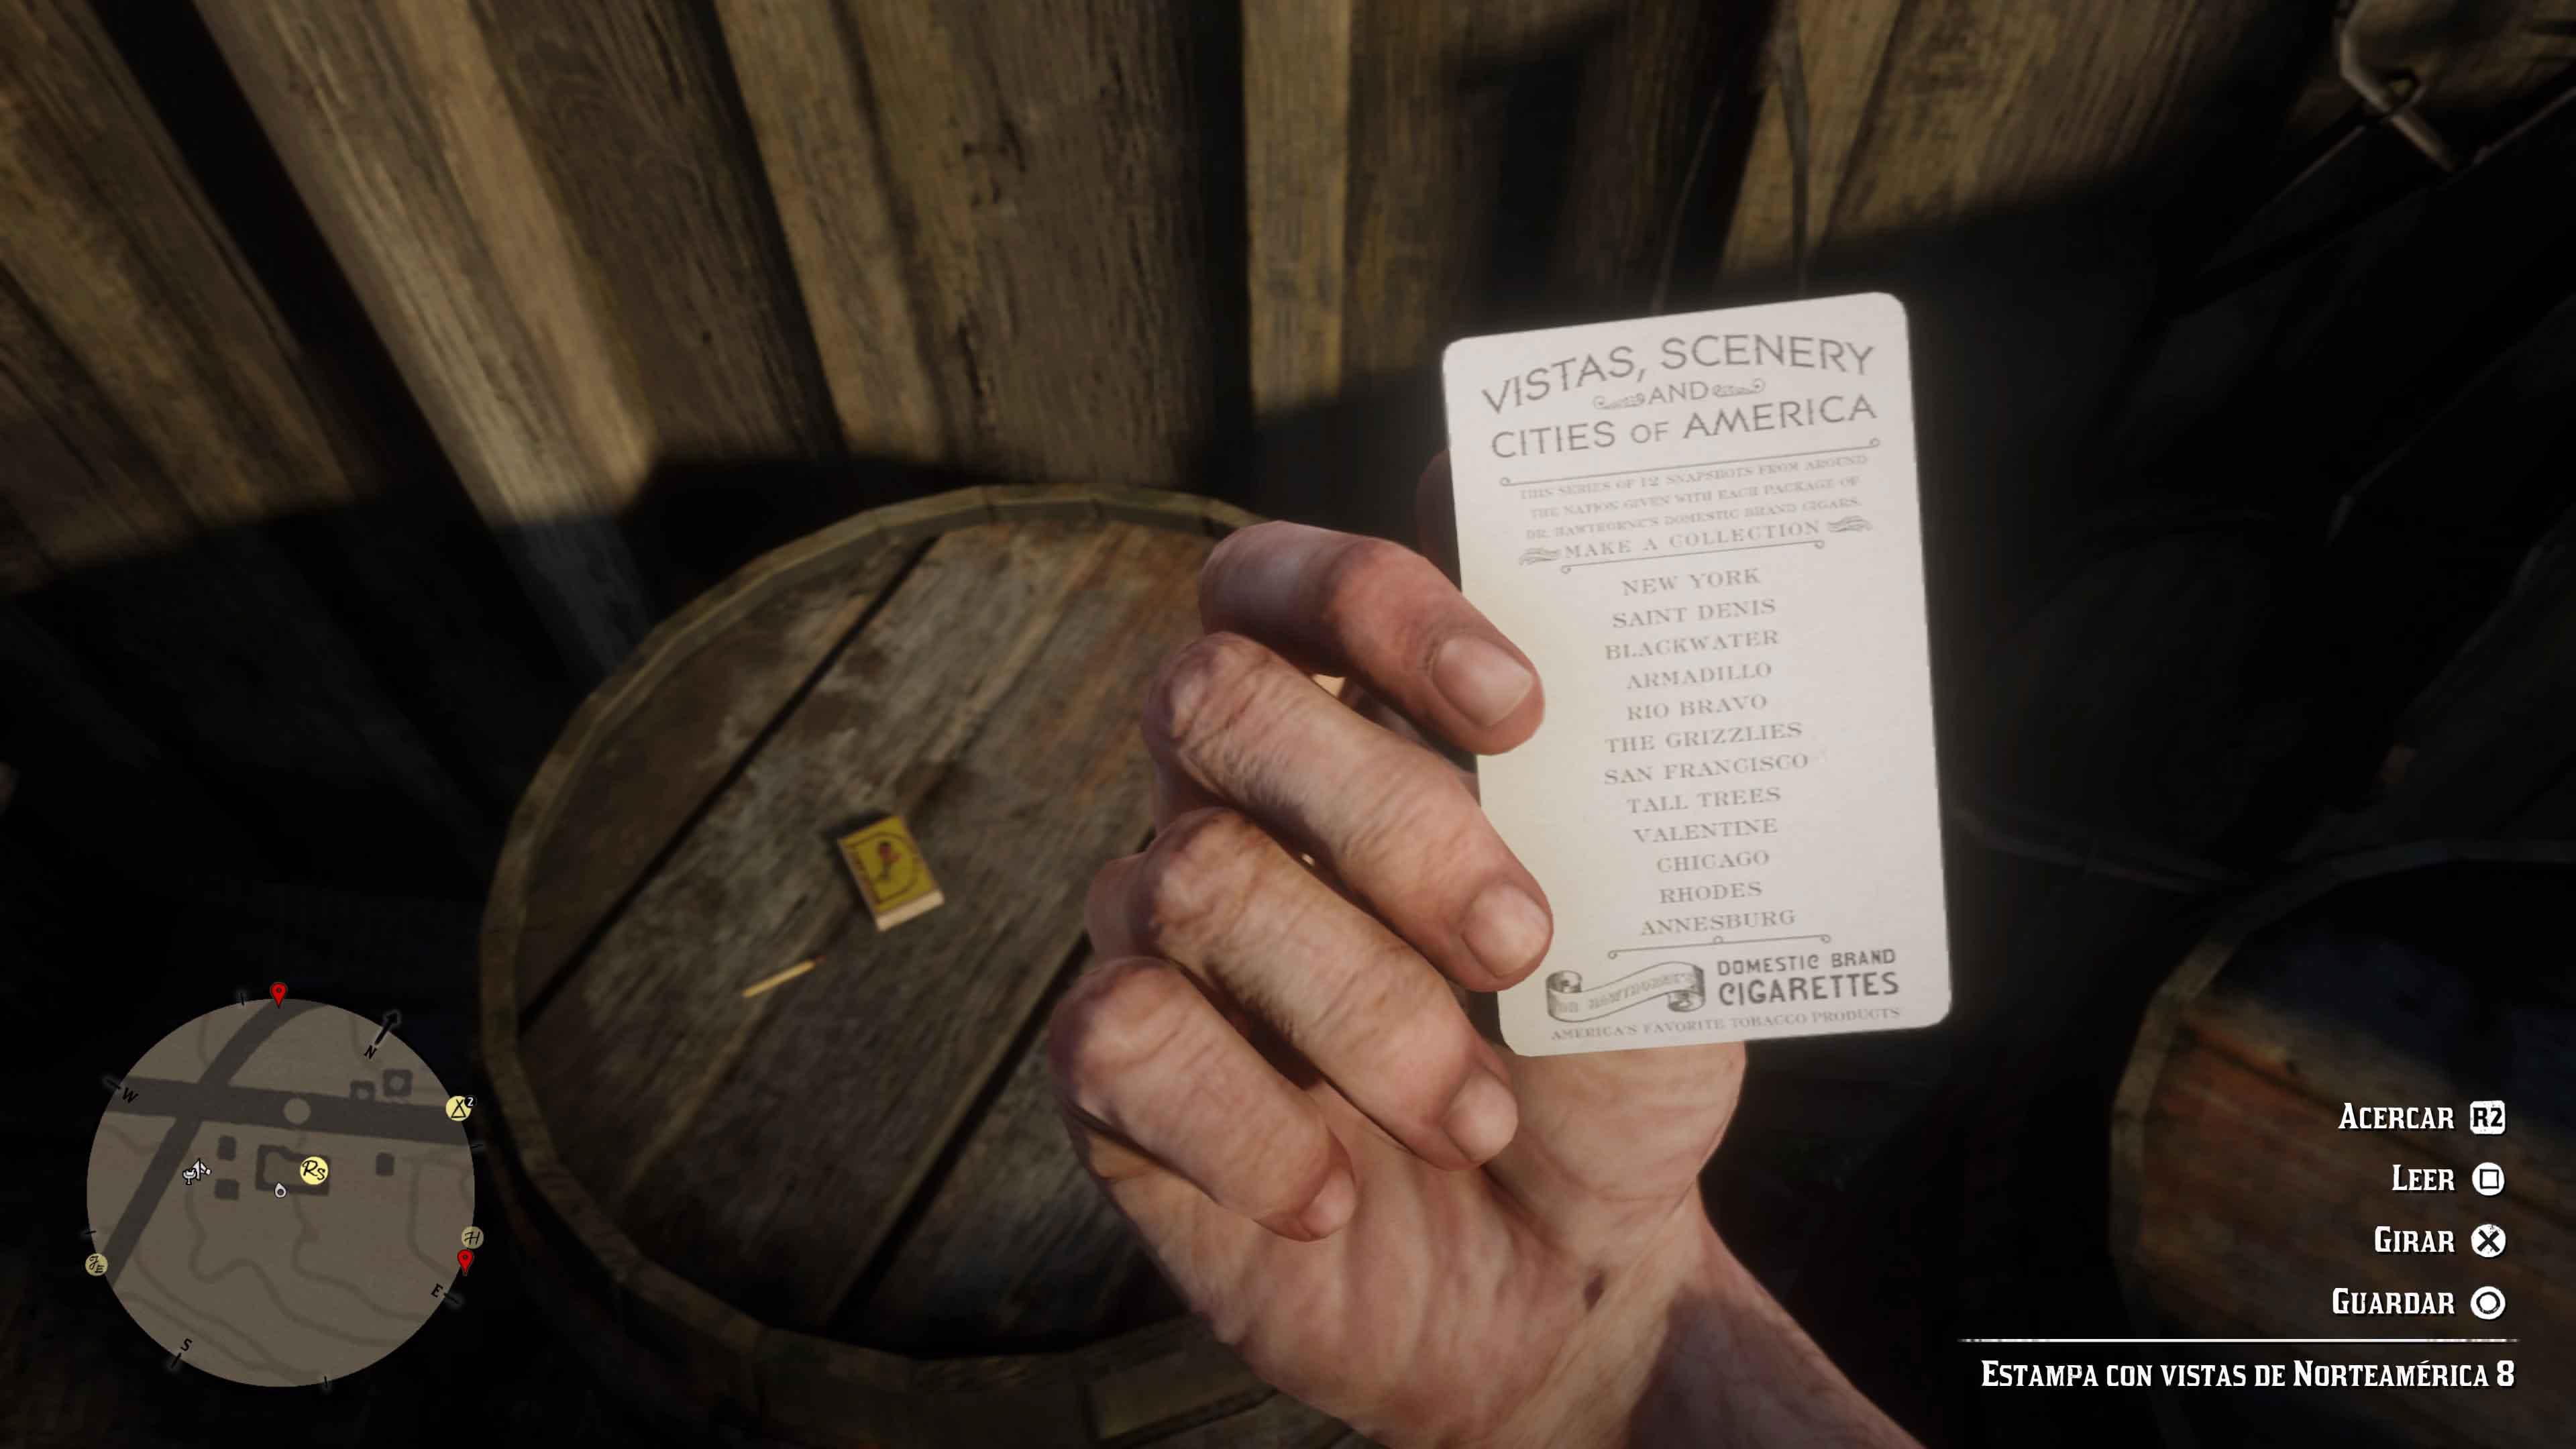 Estampas Red Dead Redemption 2